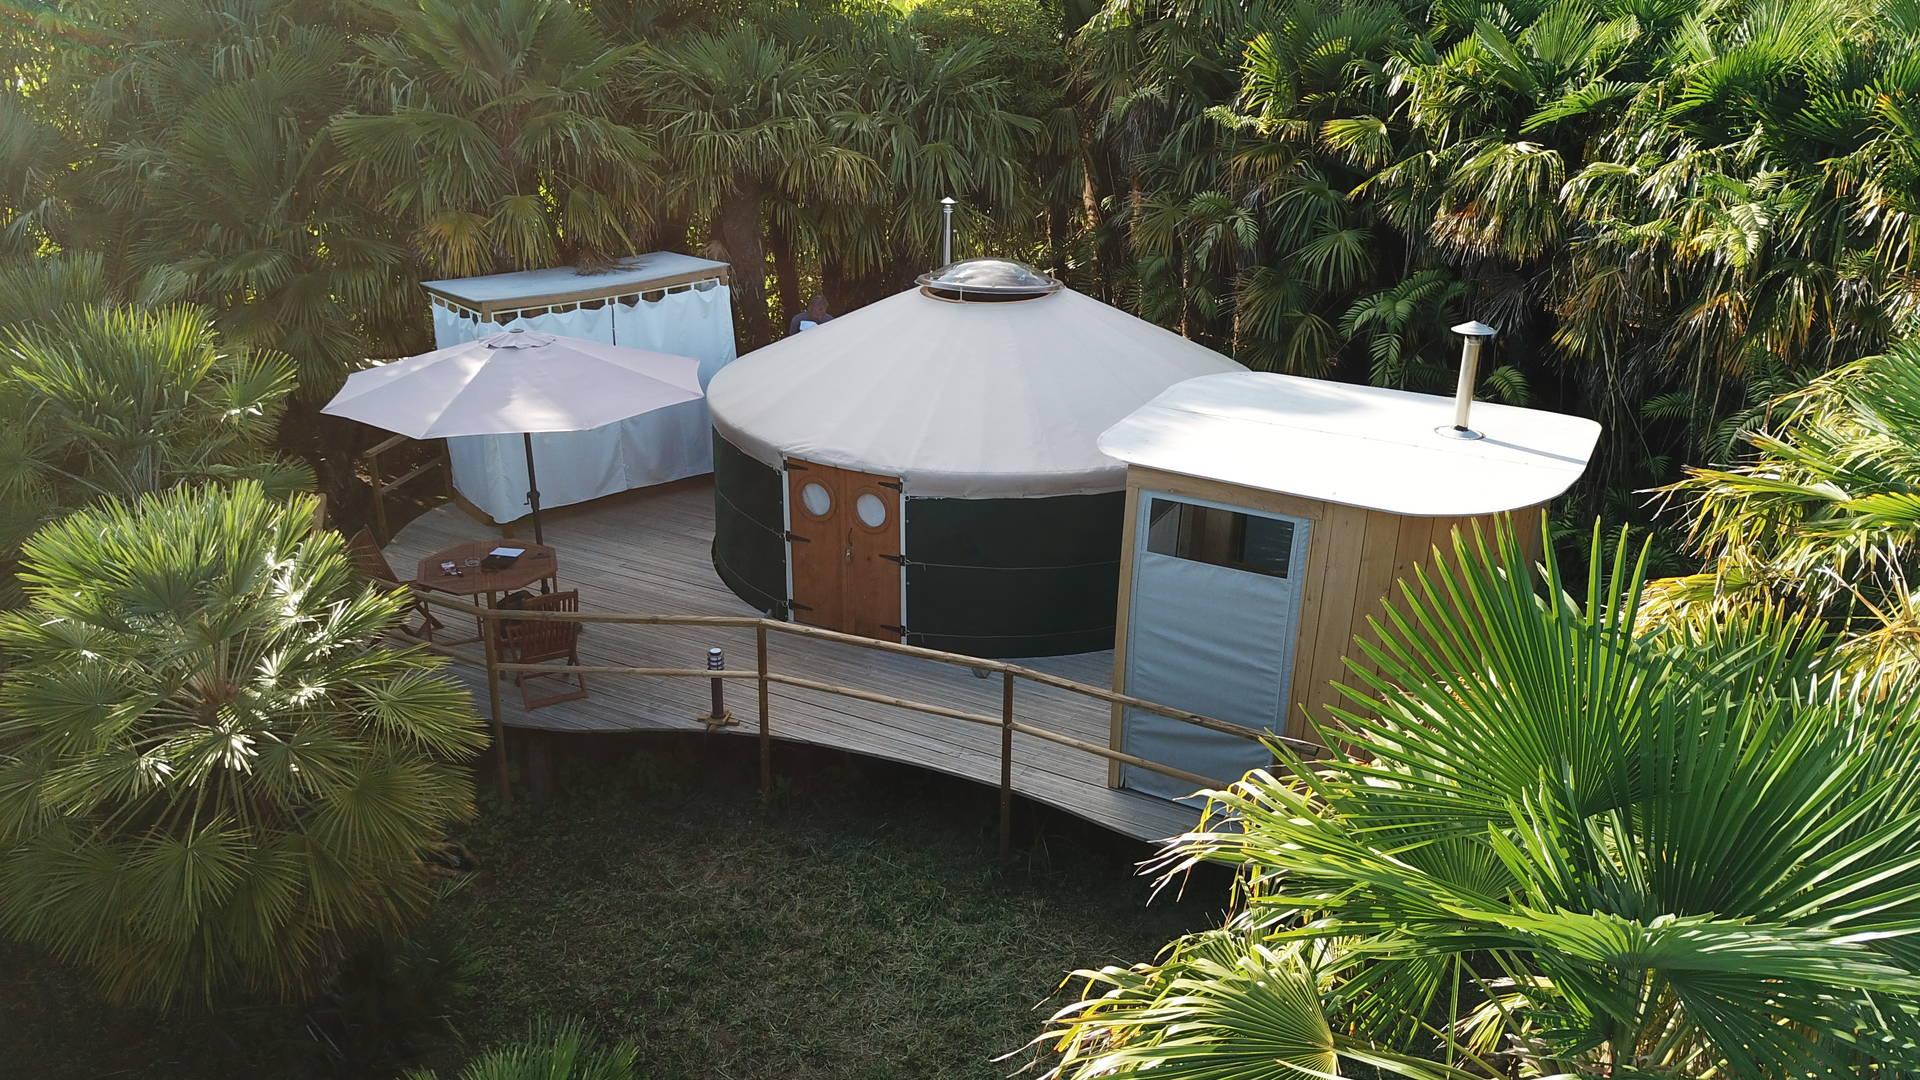 Sao Miguel - Azul singular yurt